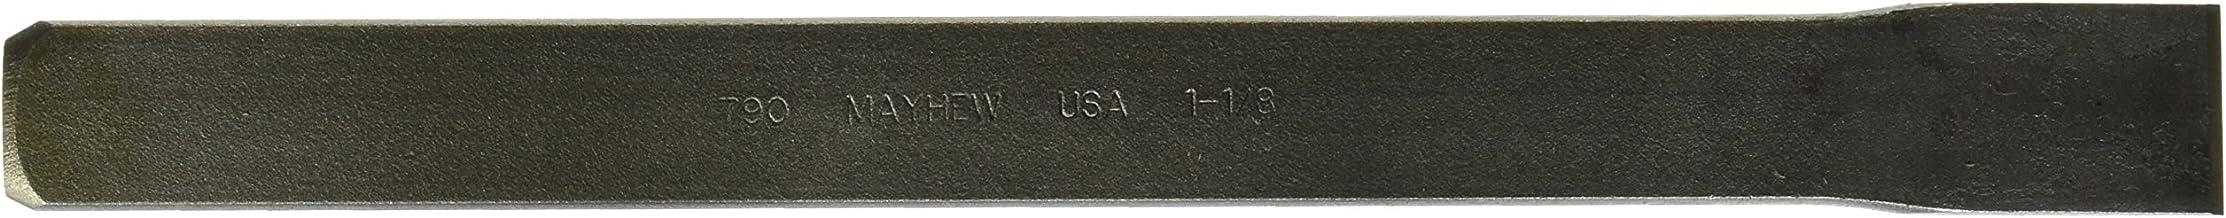 Mayhew Select 34502 12 Inch Utility